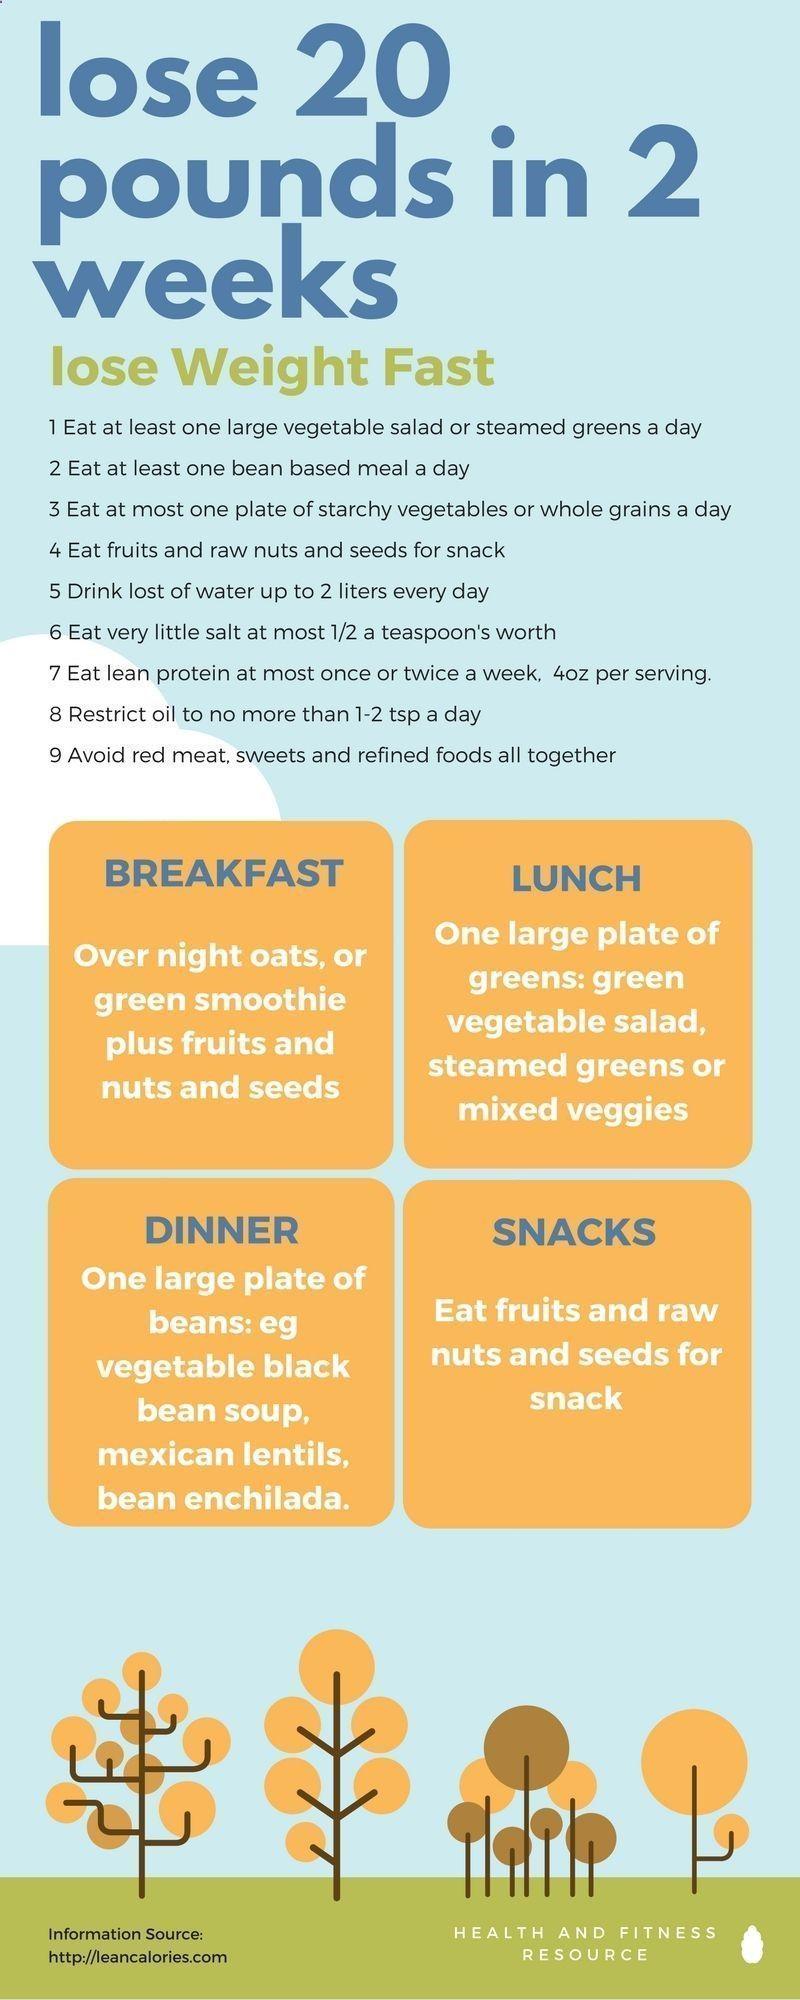 The 3 Week Diet Loss Weight Plan